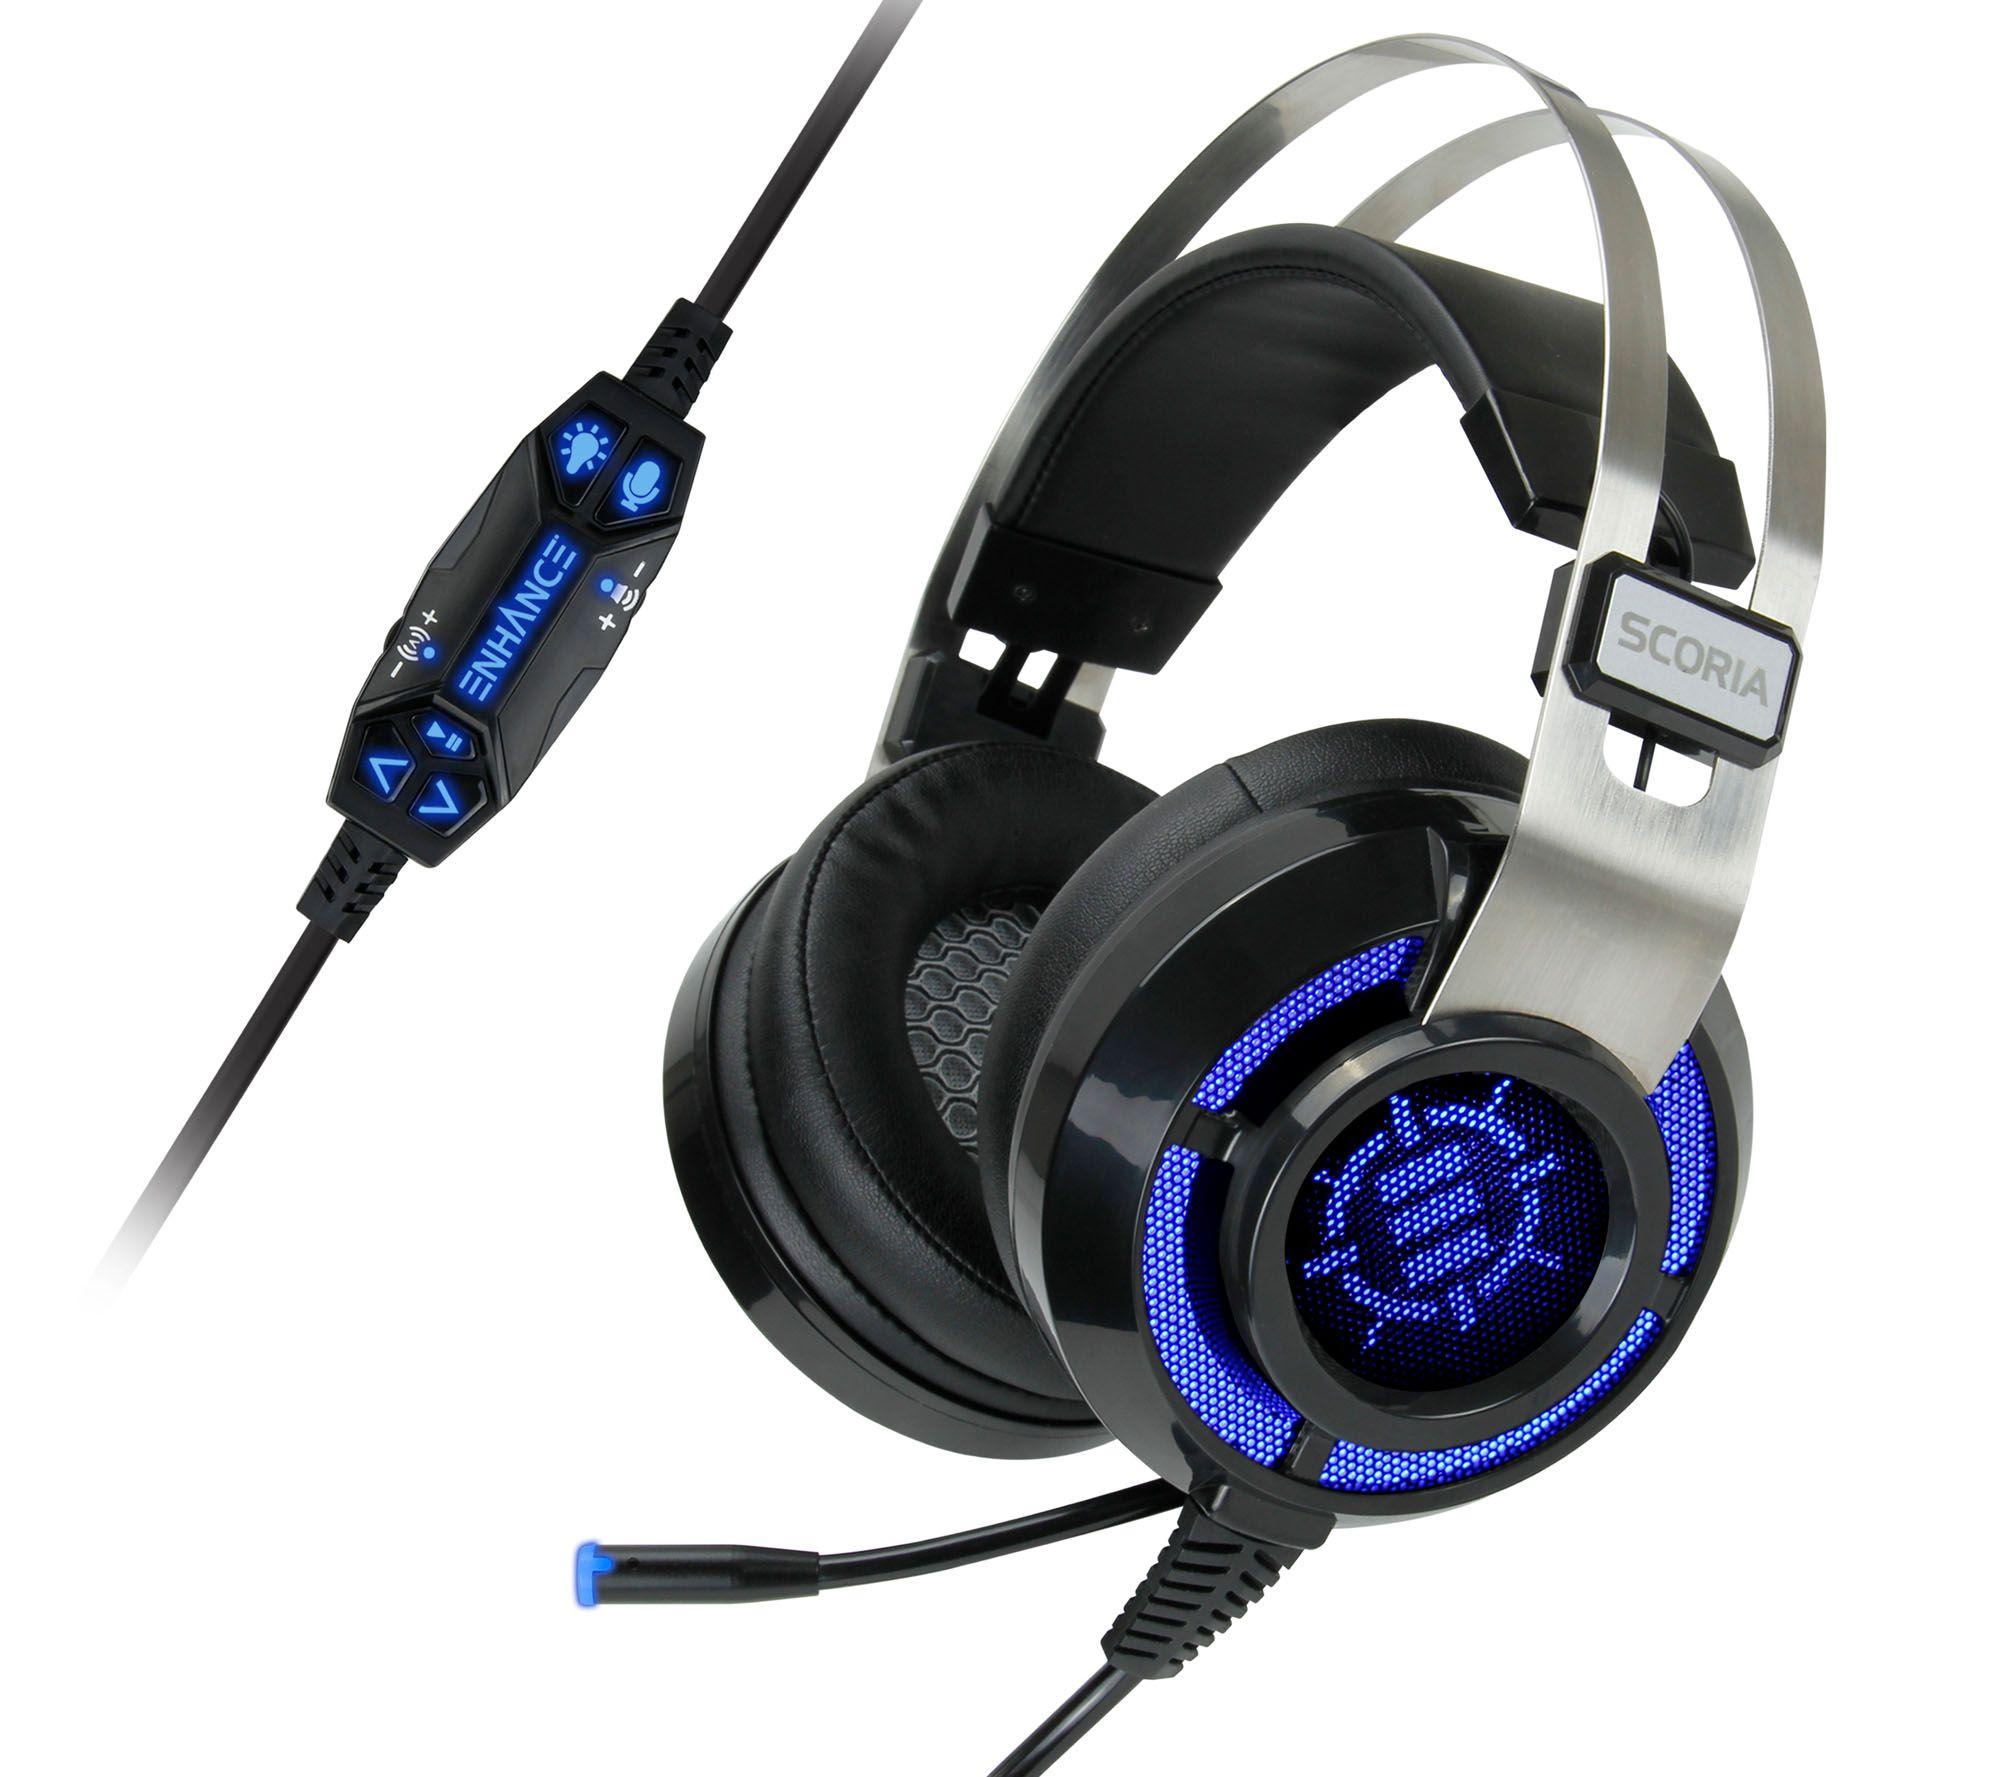 Enhance Scoria Gaming Headset For Pc Ps4 Qvc Com